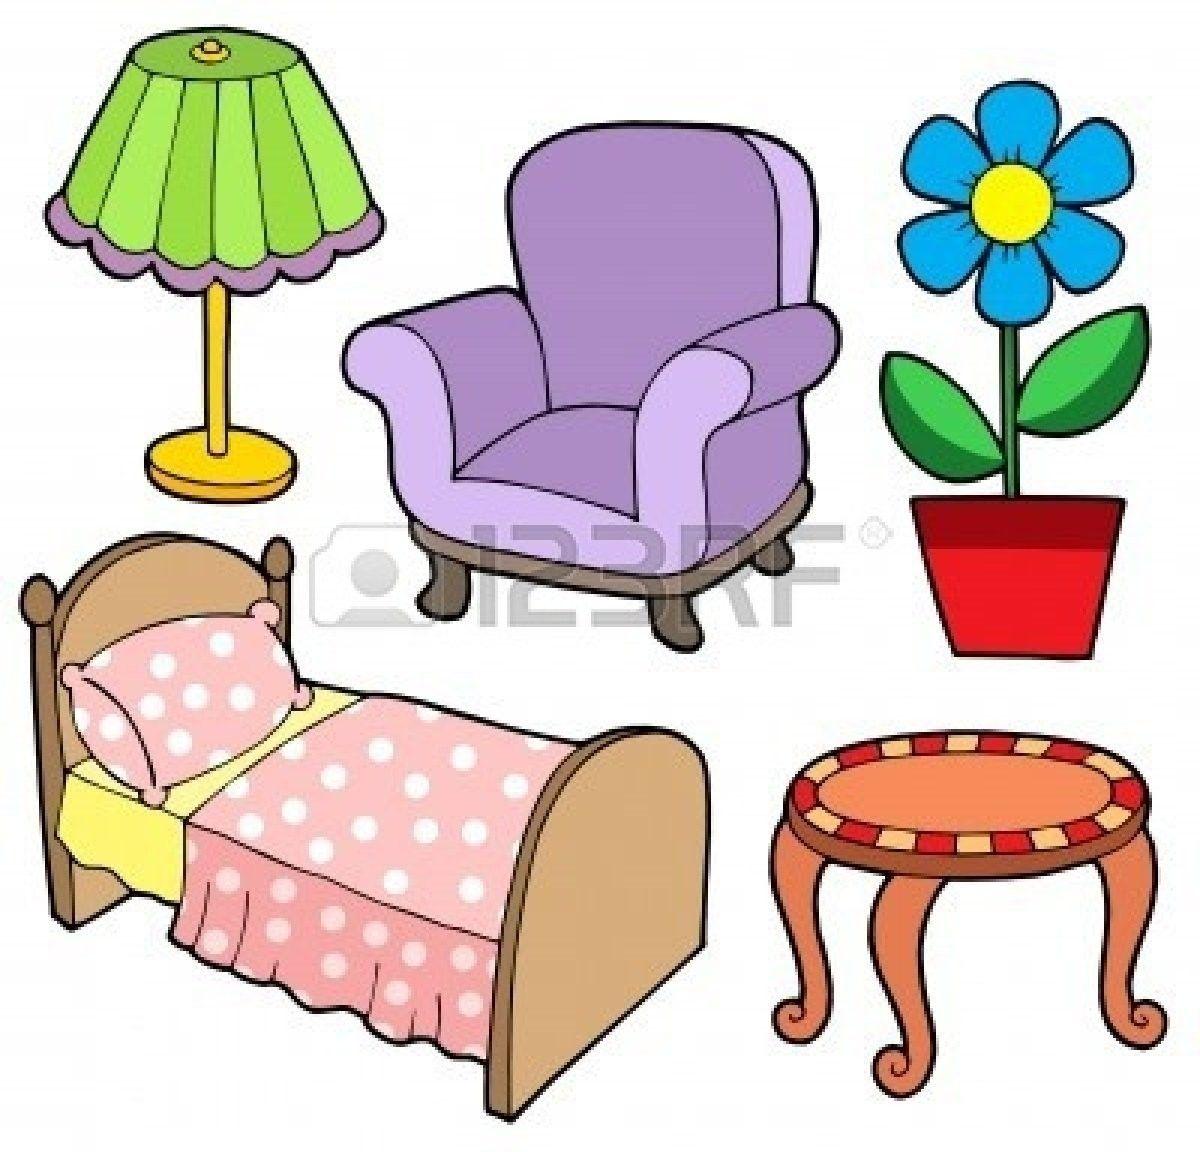 Furniture clipart household furniture. Clip art images panda